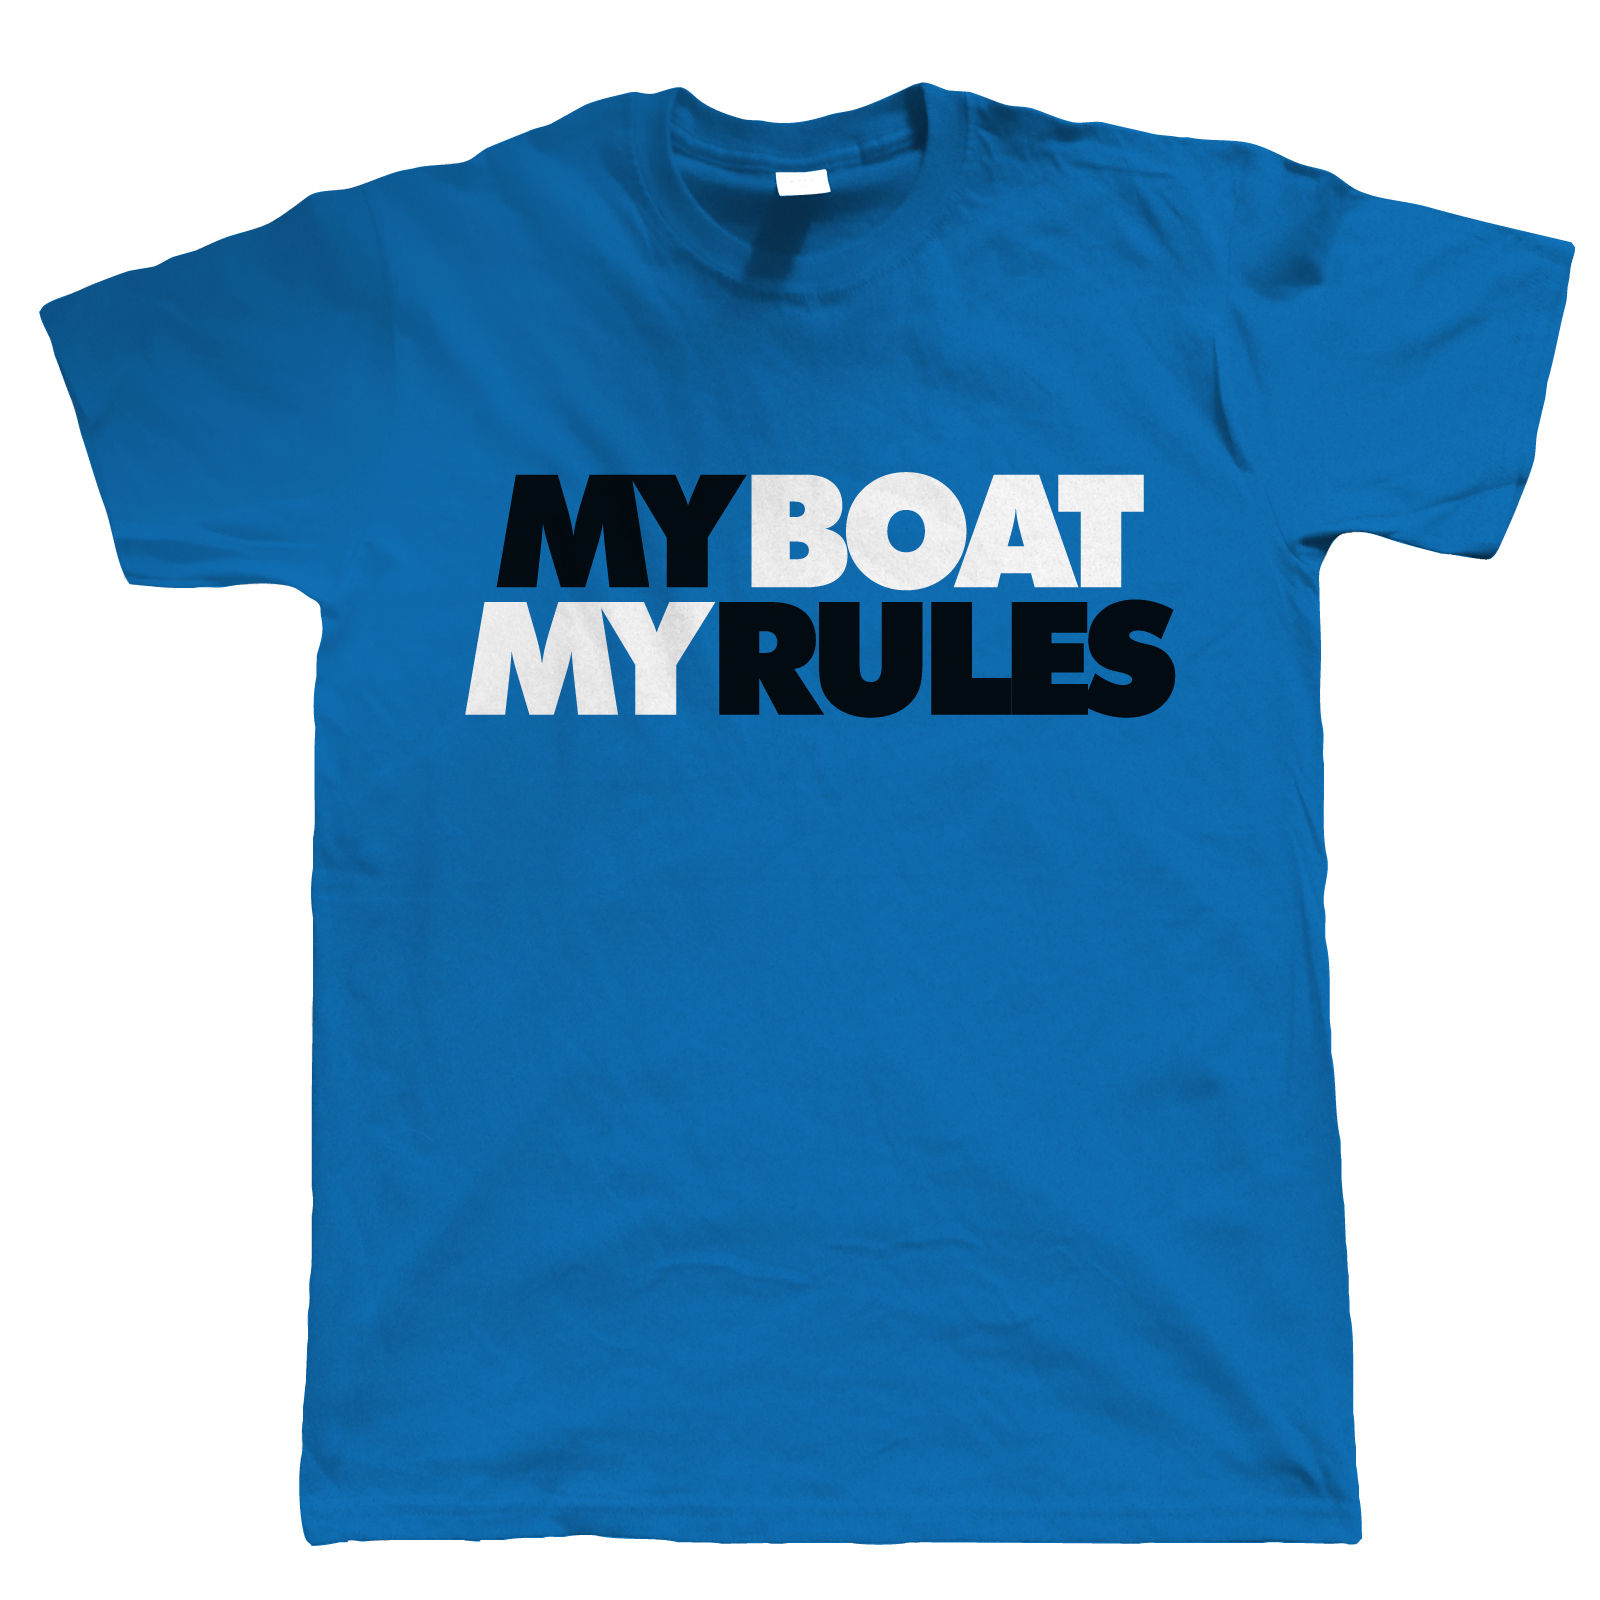 My Boat My Rules Mens Sailing T Shirt Ebay